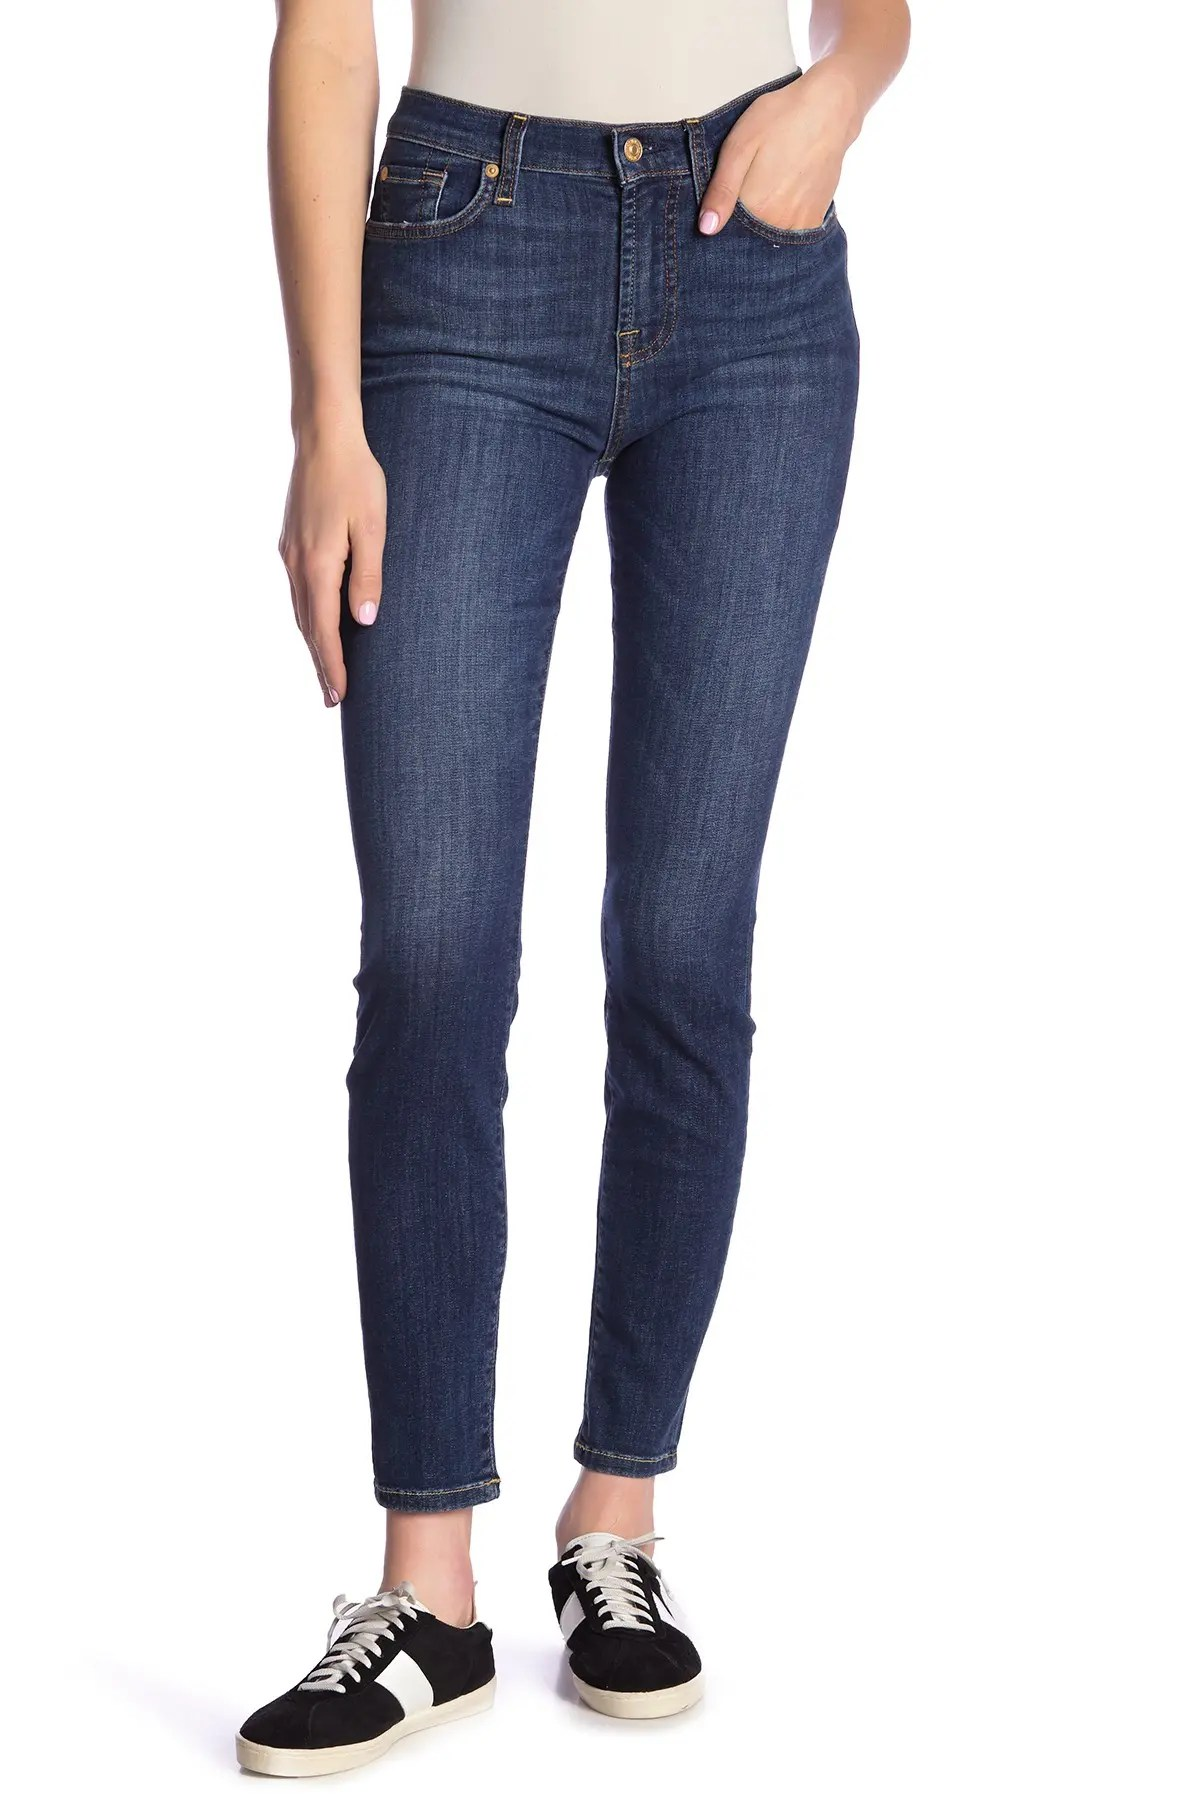 gwenevere high waist skinny jeans